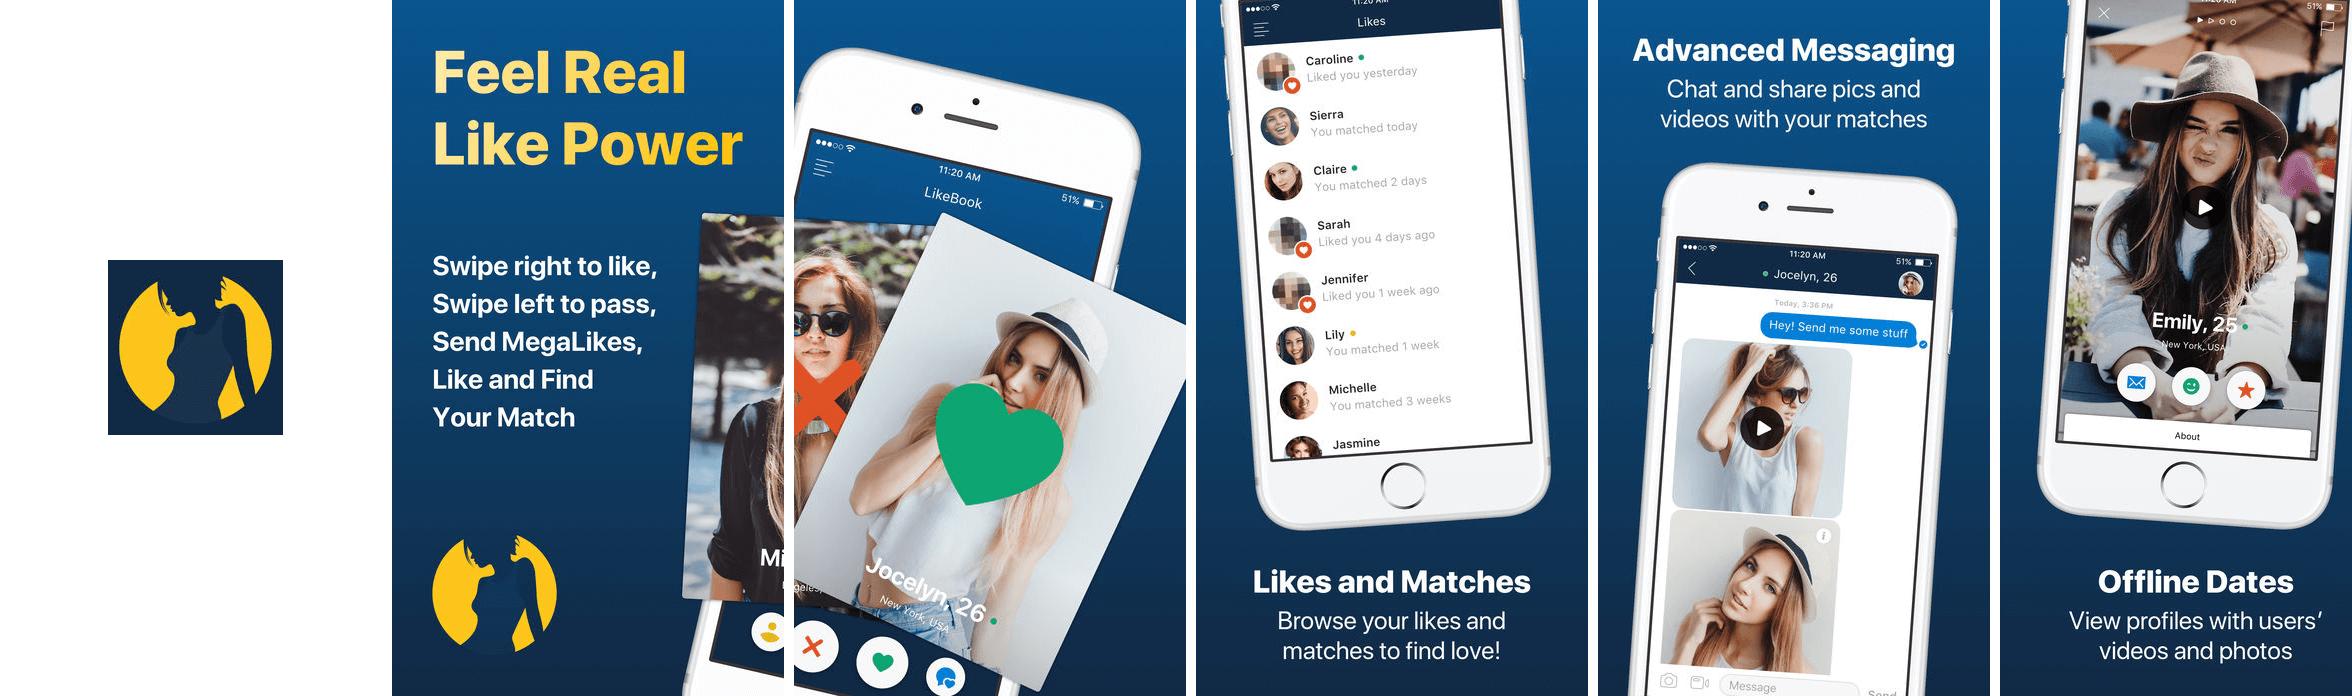 IAmNaughty – Like and Match